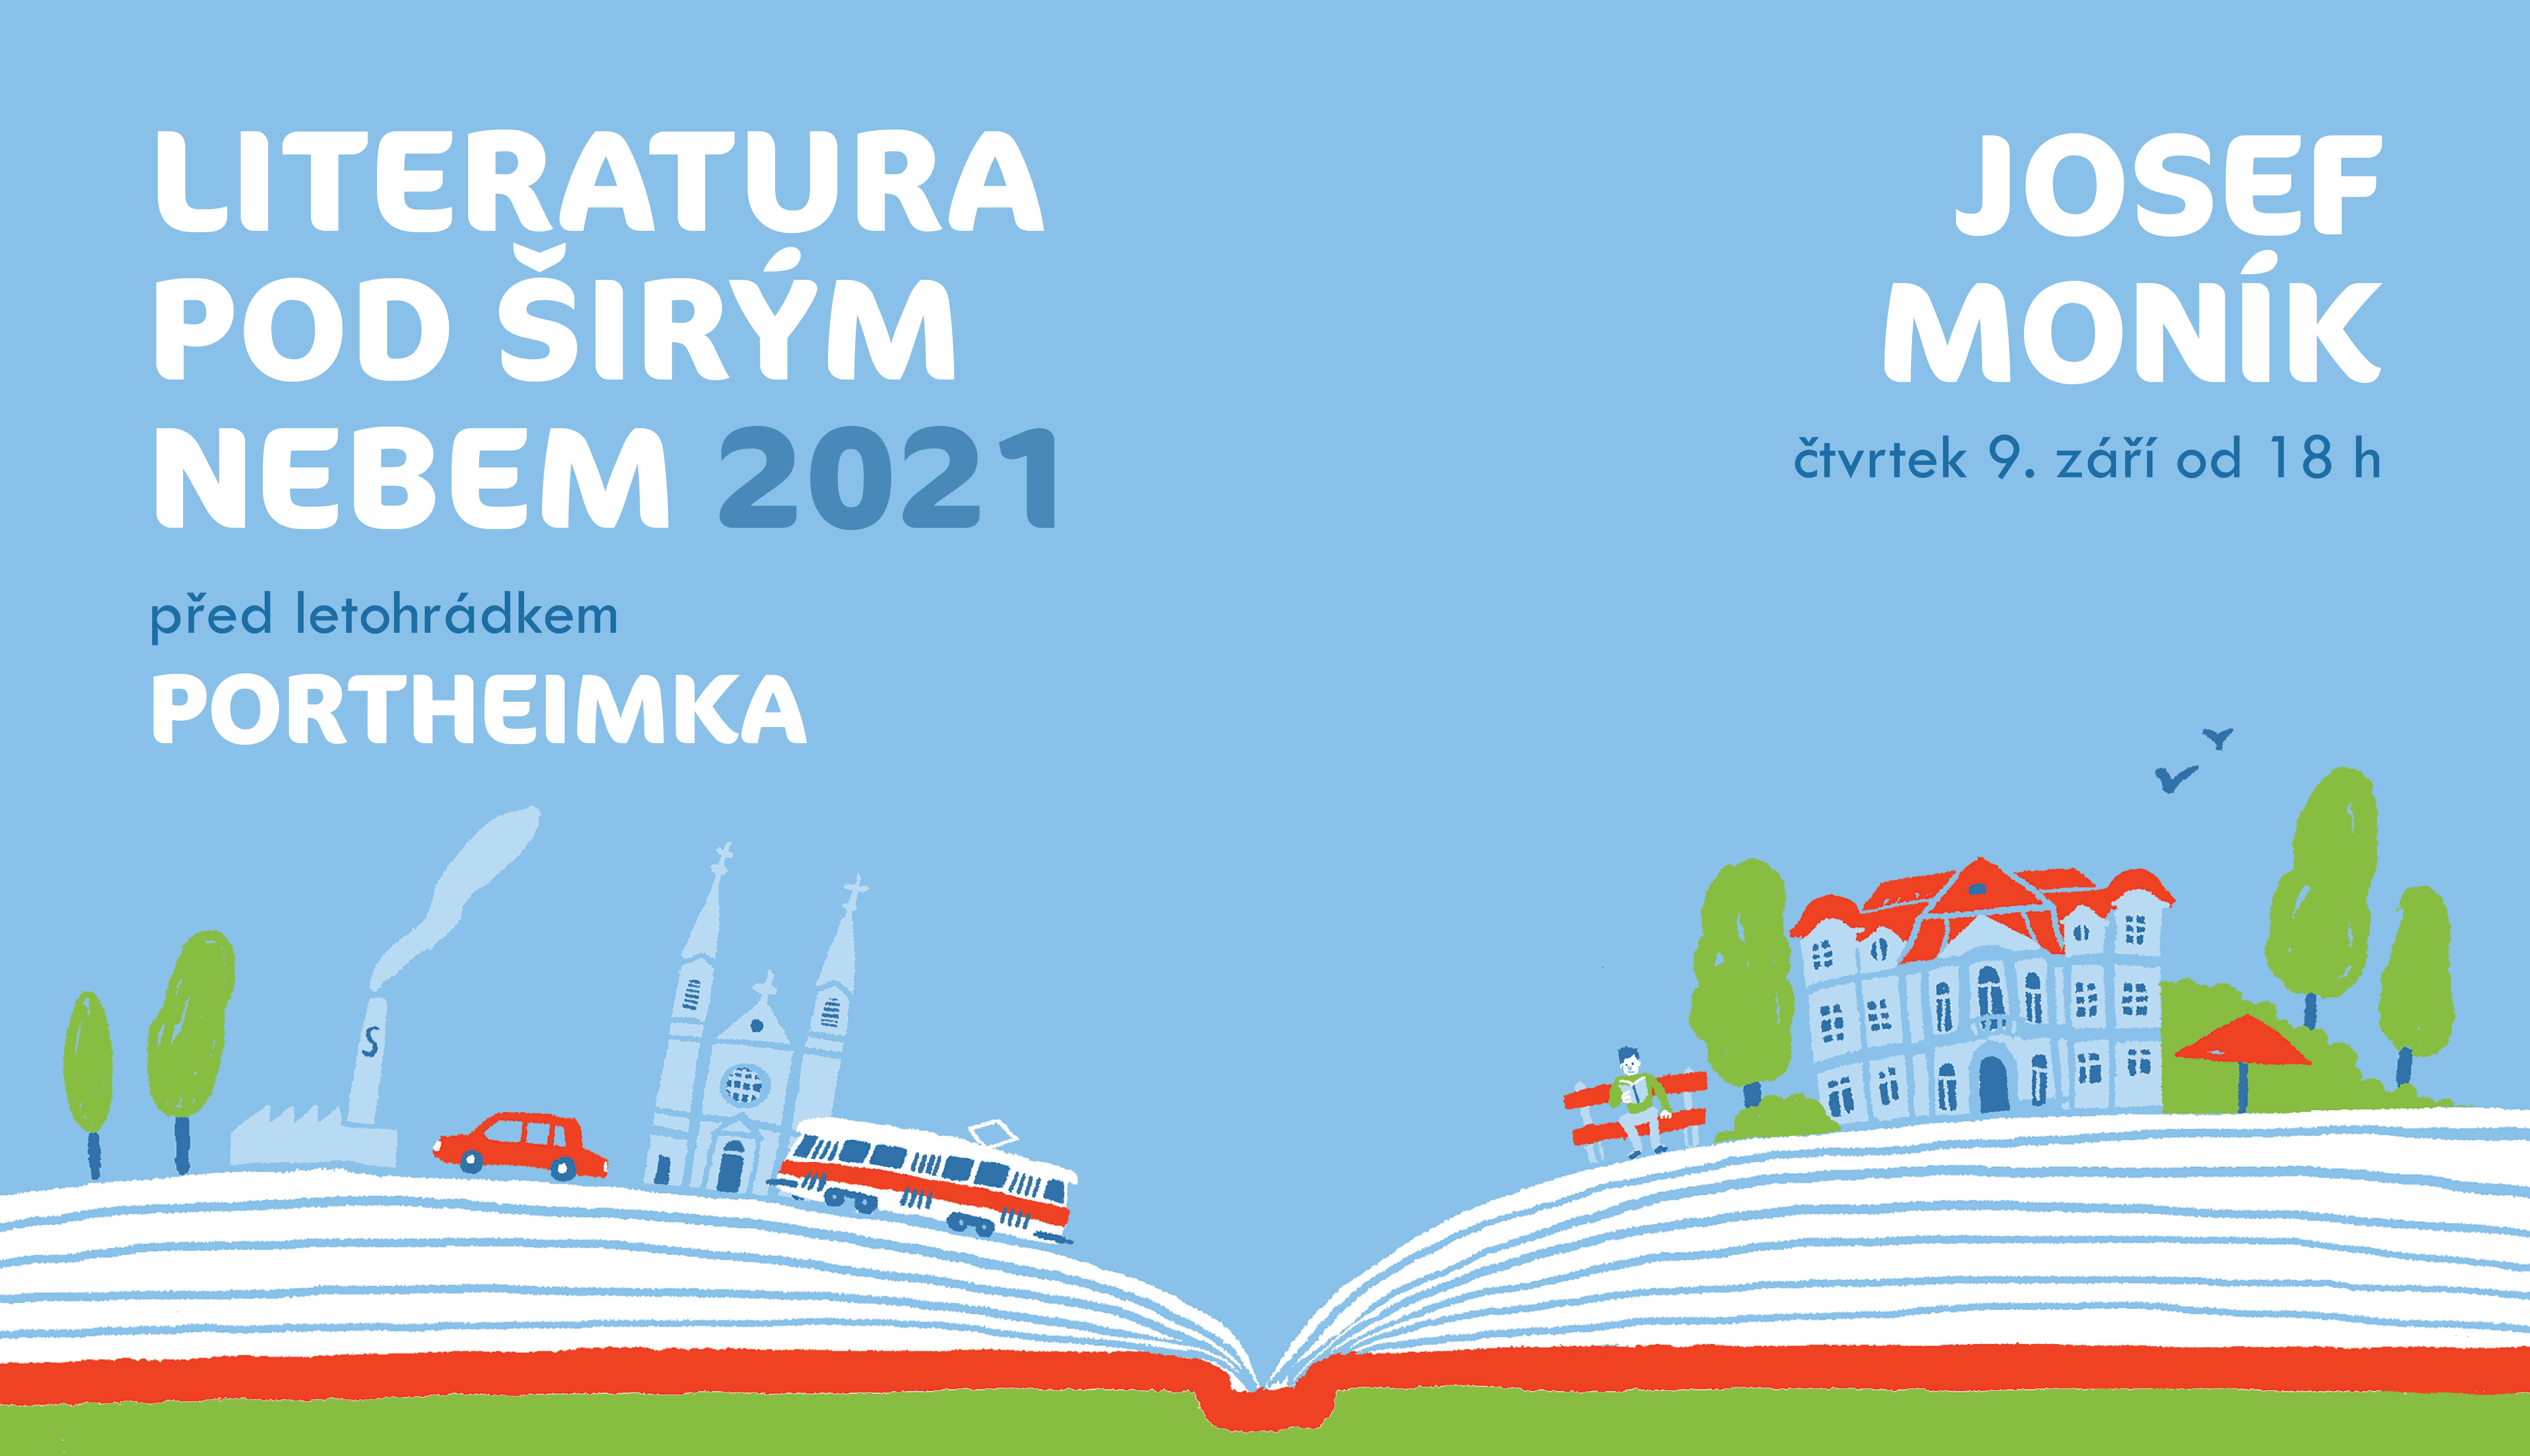 literatura-pod-sirym-nebem-uz-ve-ctvrtek-9-zari-v-letohradku-portheimka